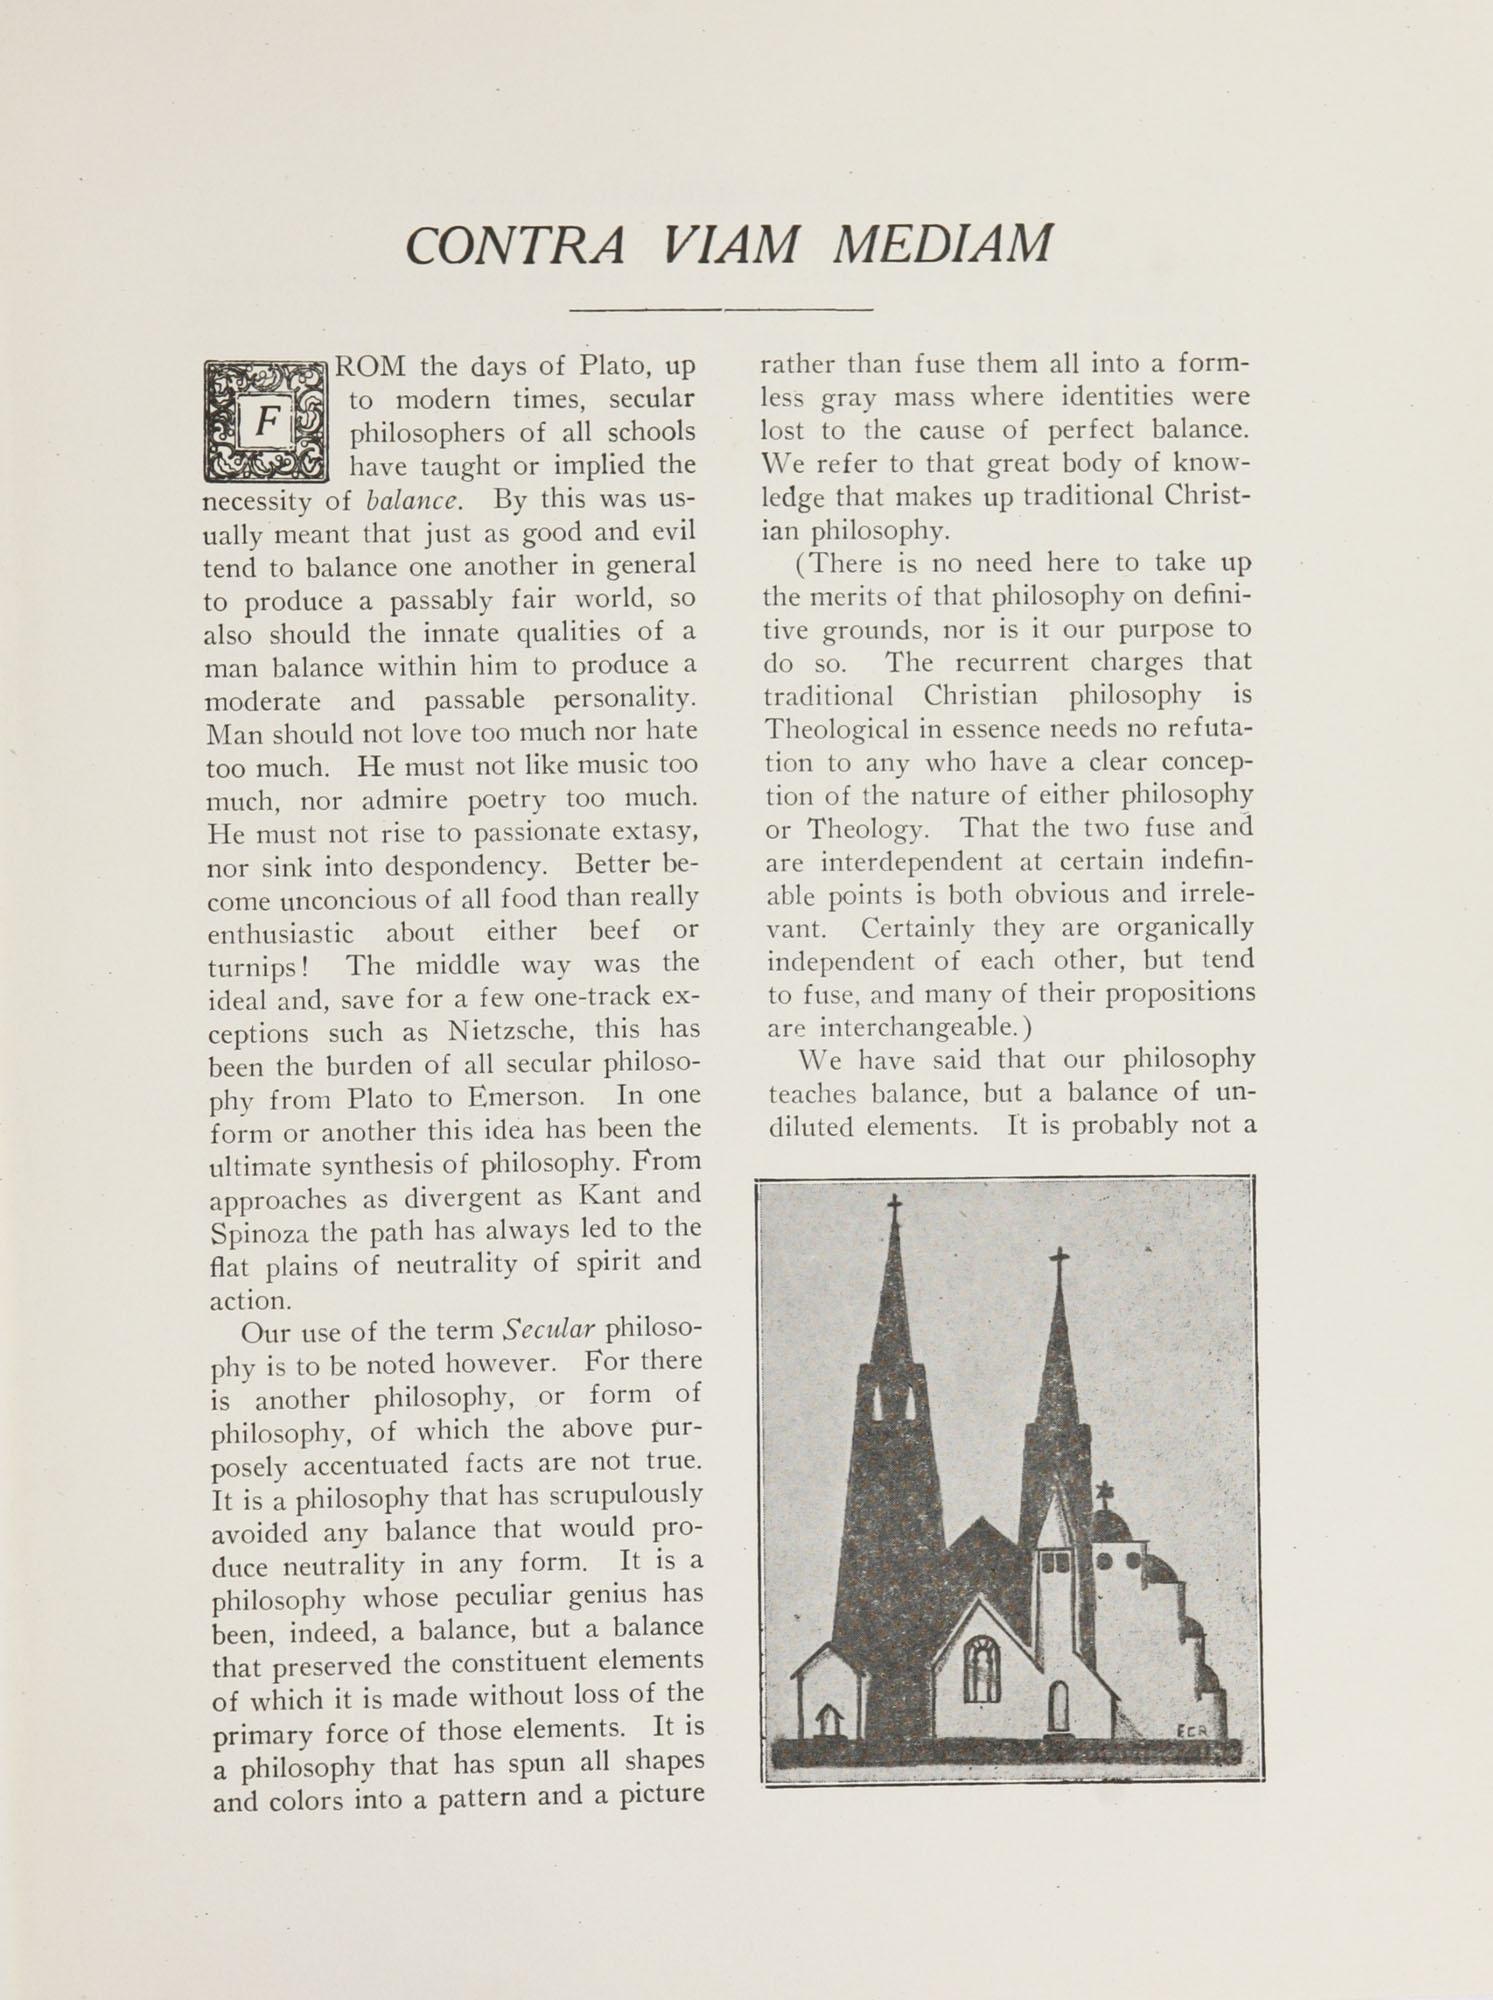 College of Charleston Magazine, 1937-1938, Vol. XXXXI No. 1, page 11